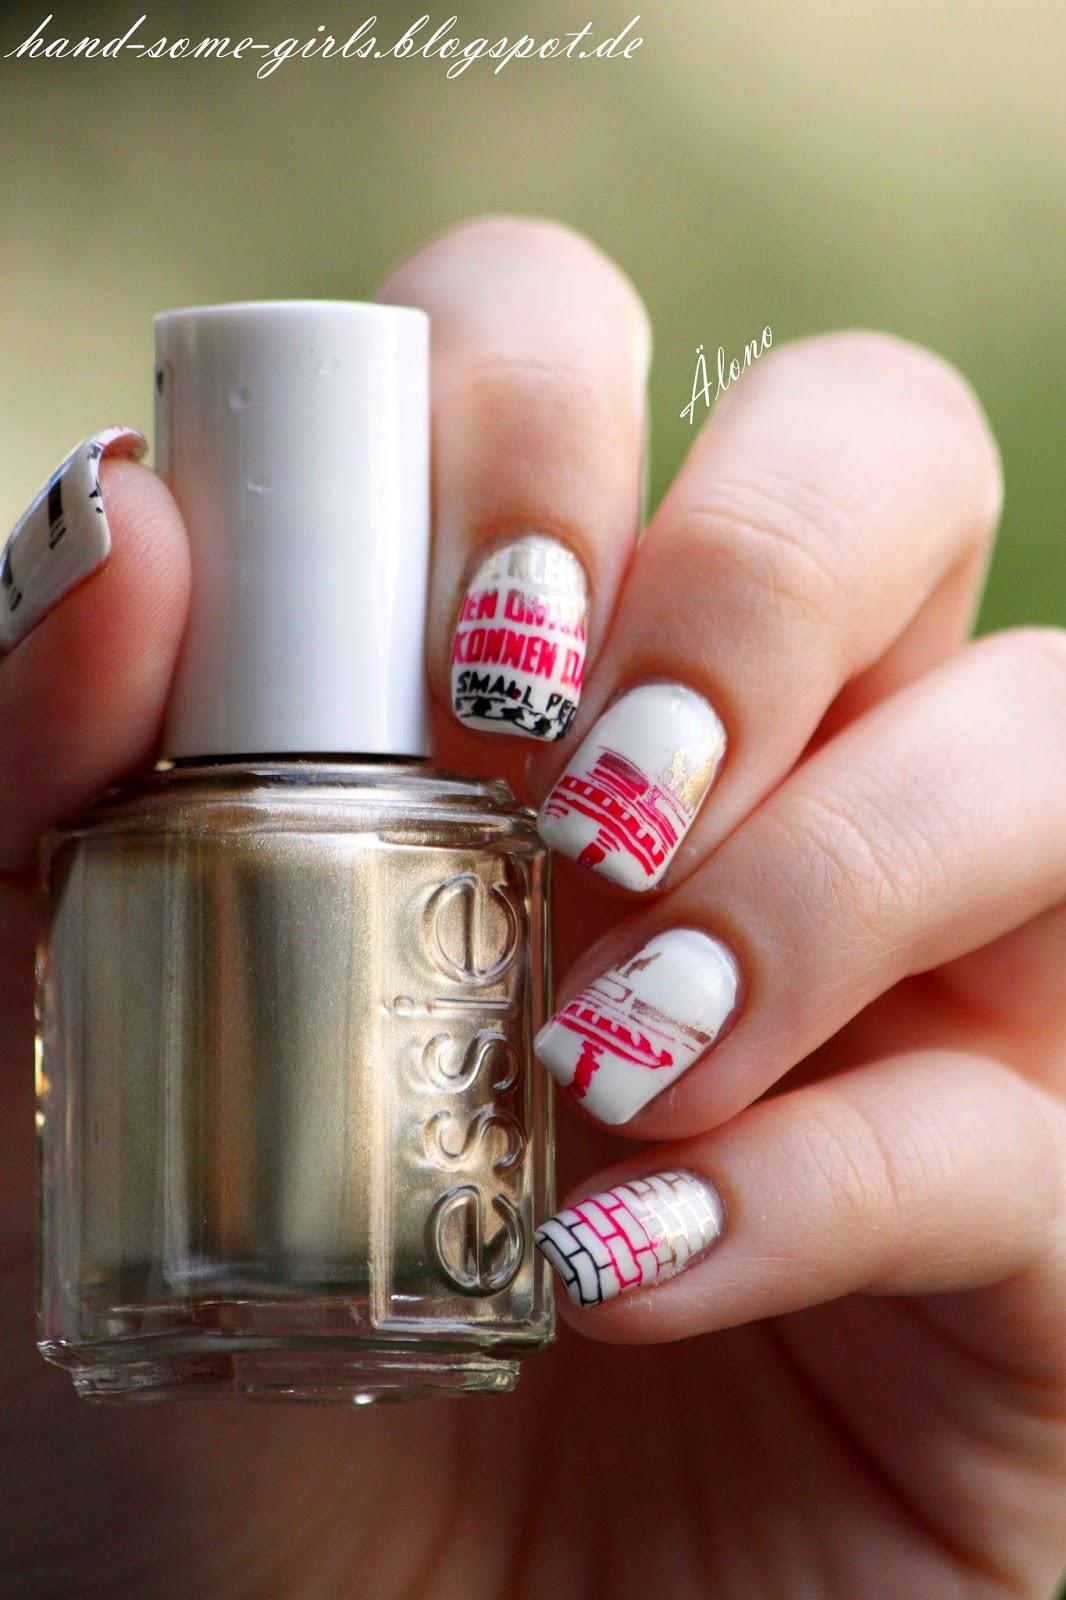 Berühmt Rautenförmigen Nägel Bilder - Nagellack-Ideen ...